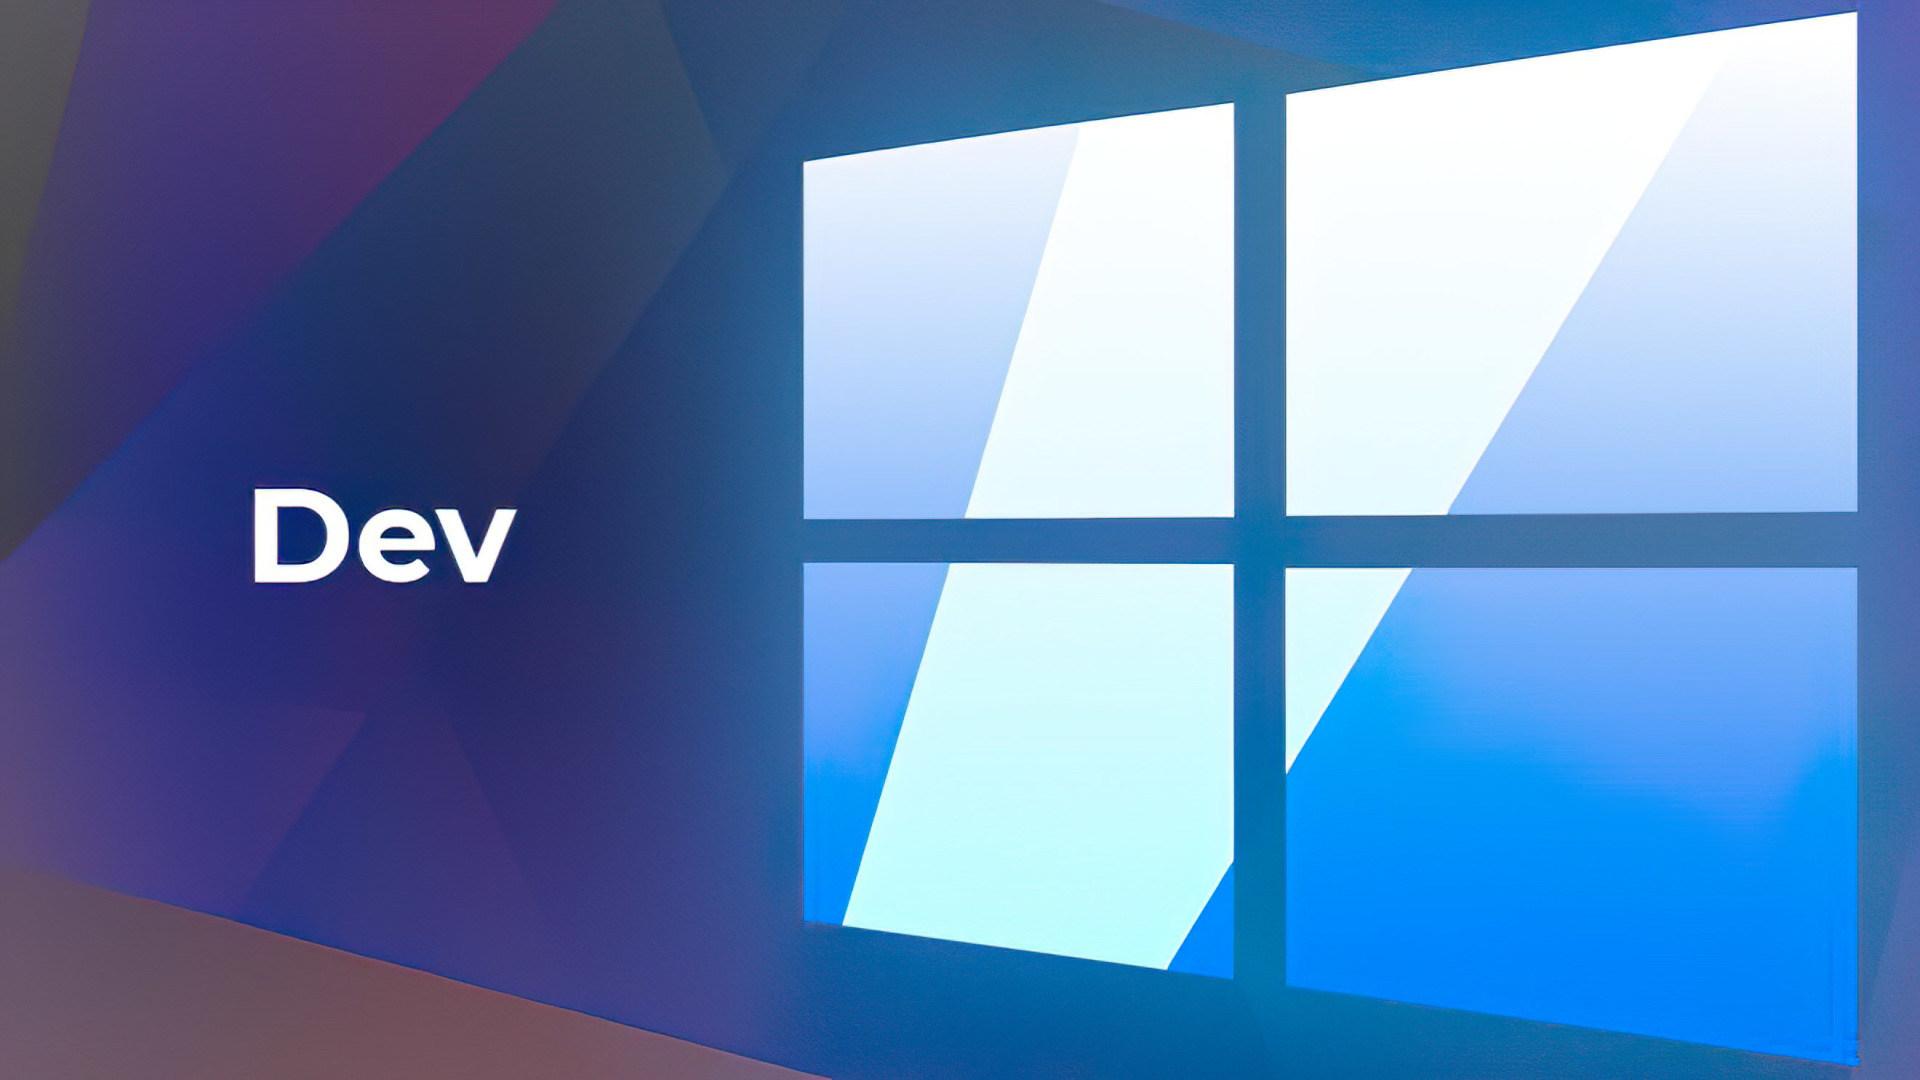 Microsoft, Windows 10, Beta, Windows Insider, Insider Preview, Windows 10 Insider Preview, Insider, Windows 10 Preview, Windows Insider Program, Windows Insider Preview, Developer Preview, Development, Dev, Windows Logo, Insider Program, Windows 10 Beta, Windows 10 Logo, Windows Beta, Insider Channel, Windows Insider Channel, Windows 10 Dev, dev channel, Windows Insider Dev Channel, Insider Dev Channel